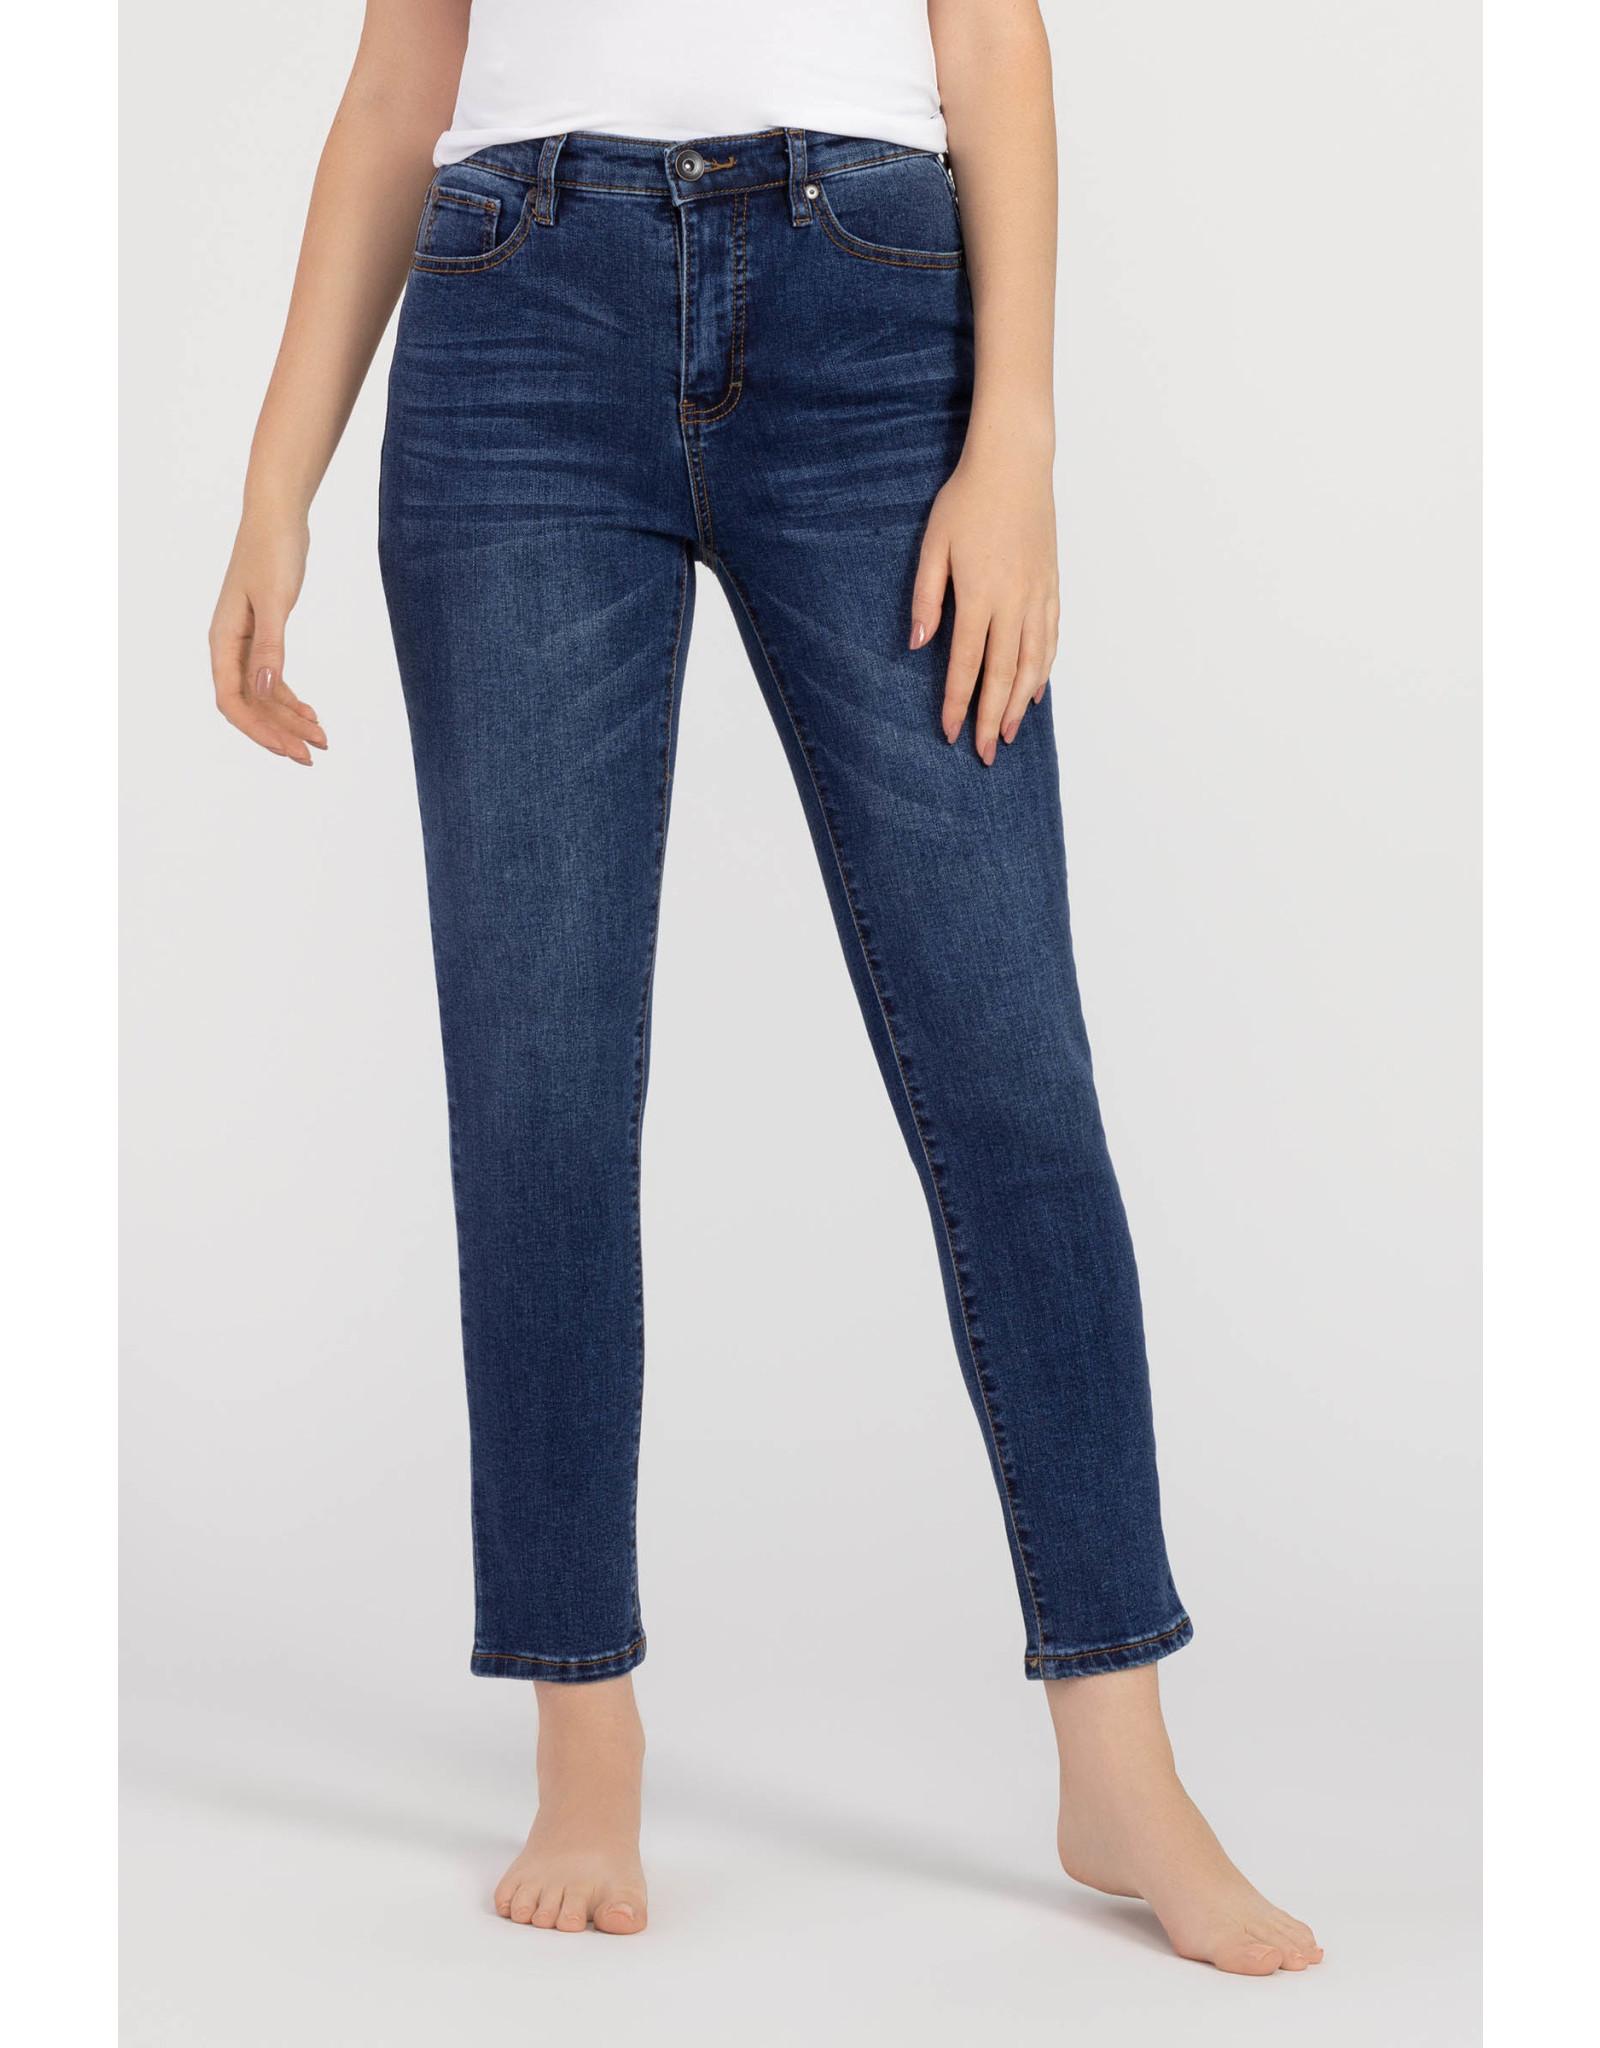 Tribal Tribal High Rise Slim Jean